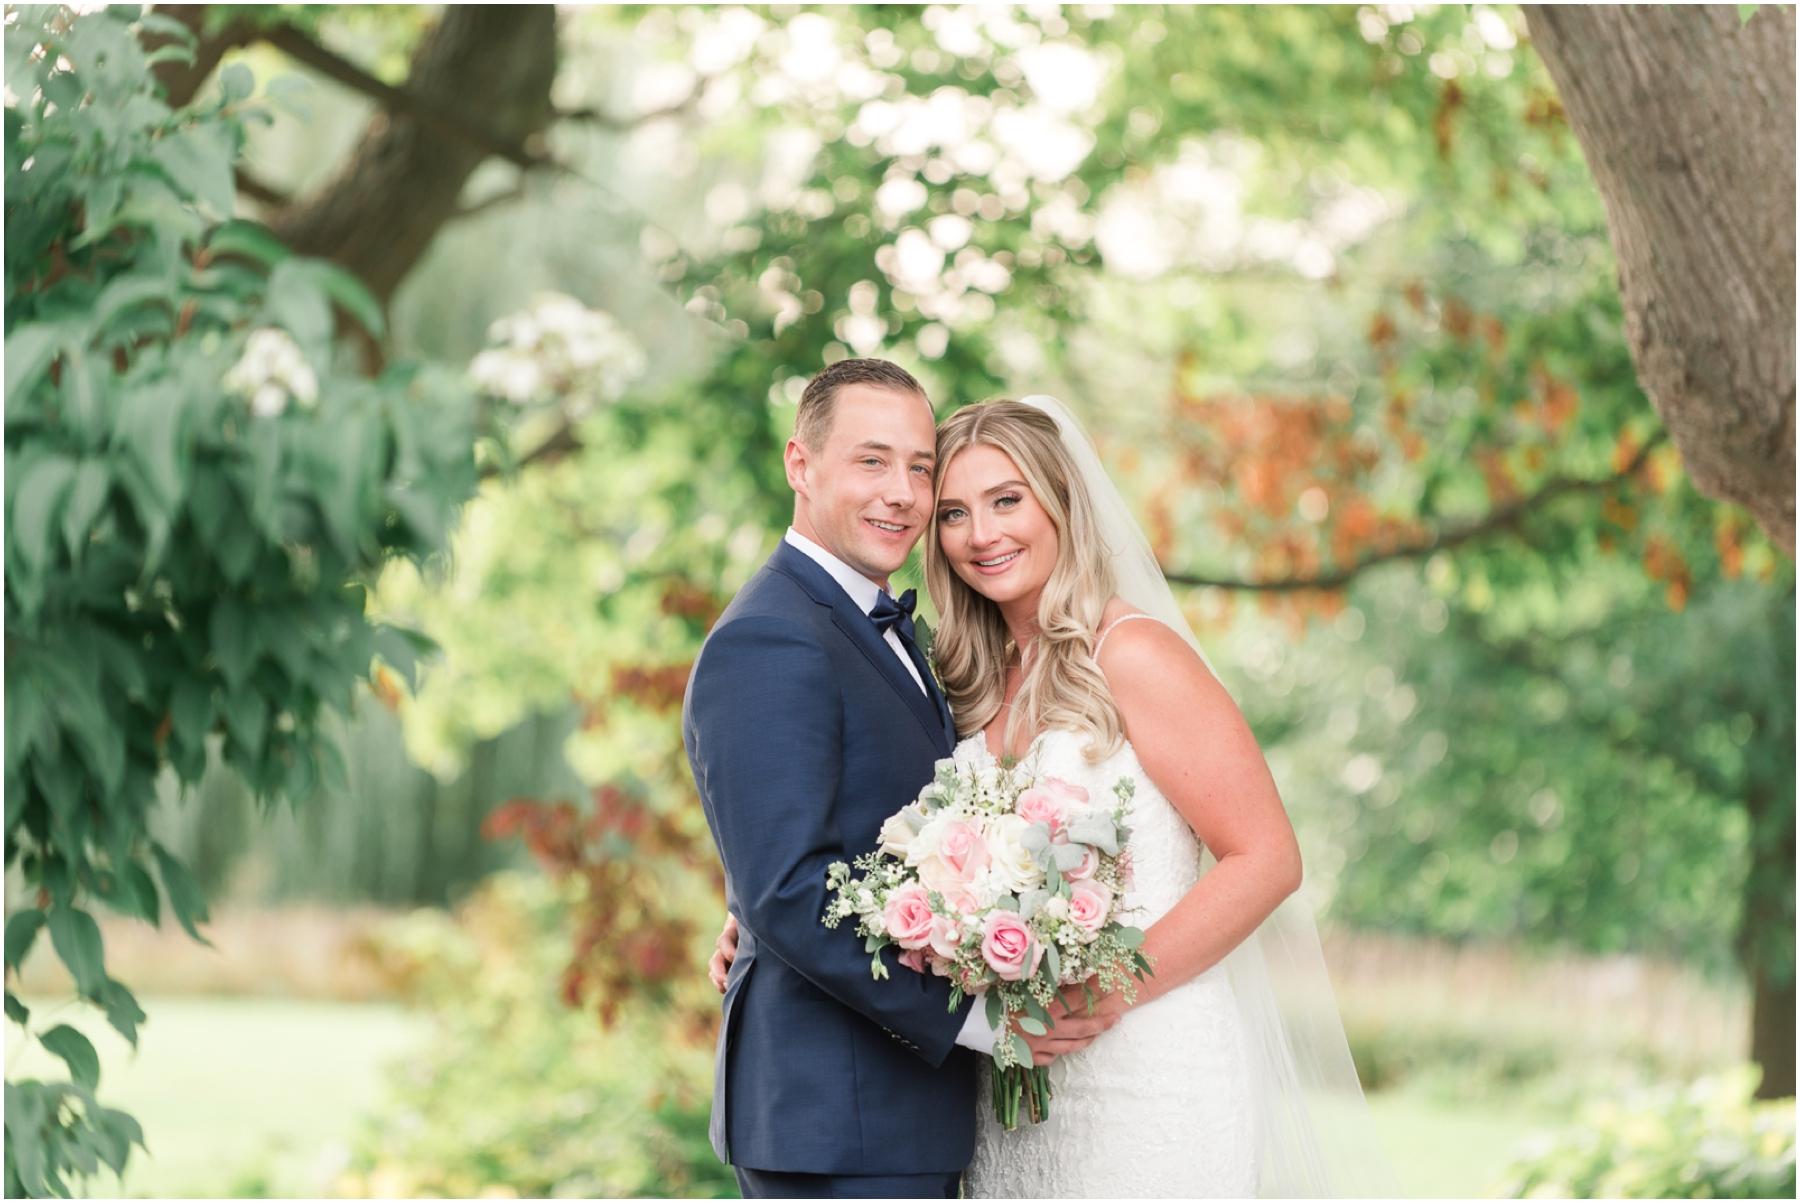 Bloom Field Gardens Wedding Precious Photography Katherine & Chris_069